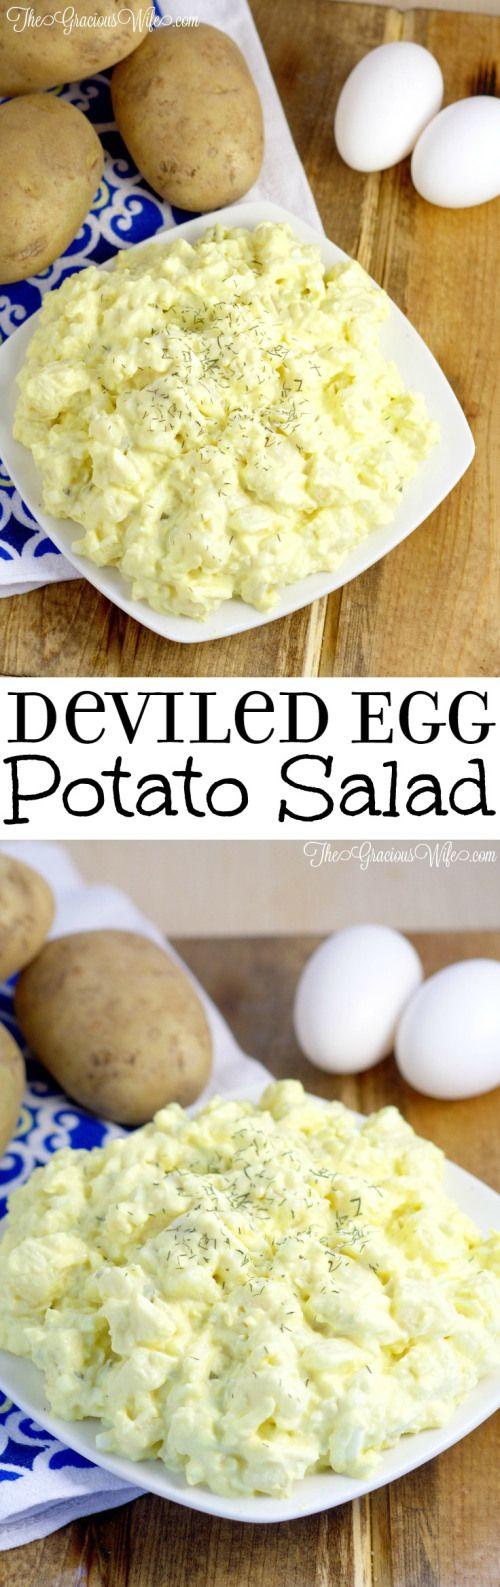 Deviled Egg Potato Salad Recipe – Easy potato salad side dish recipe inspired by devil eggs. Perfect for BBQ, picnics, and